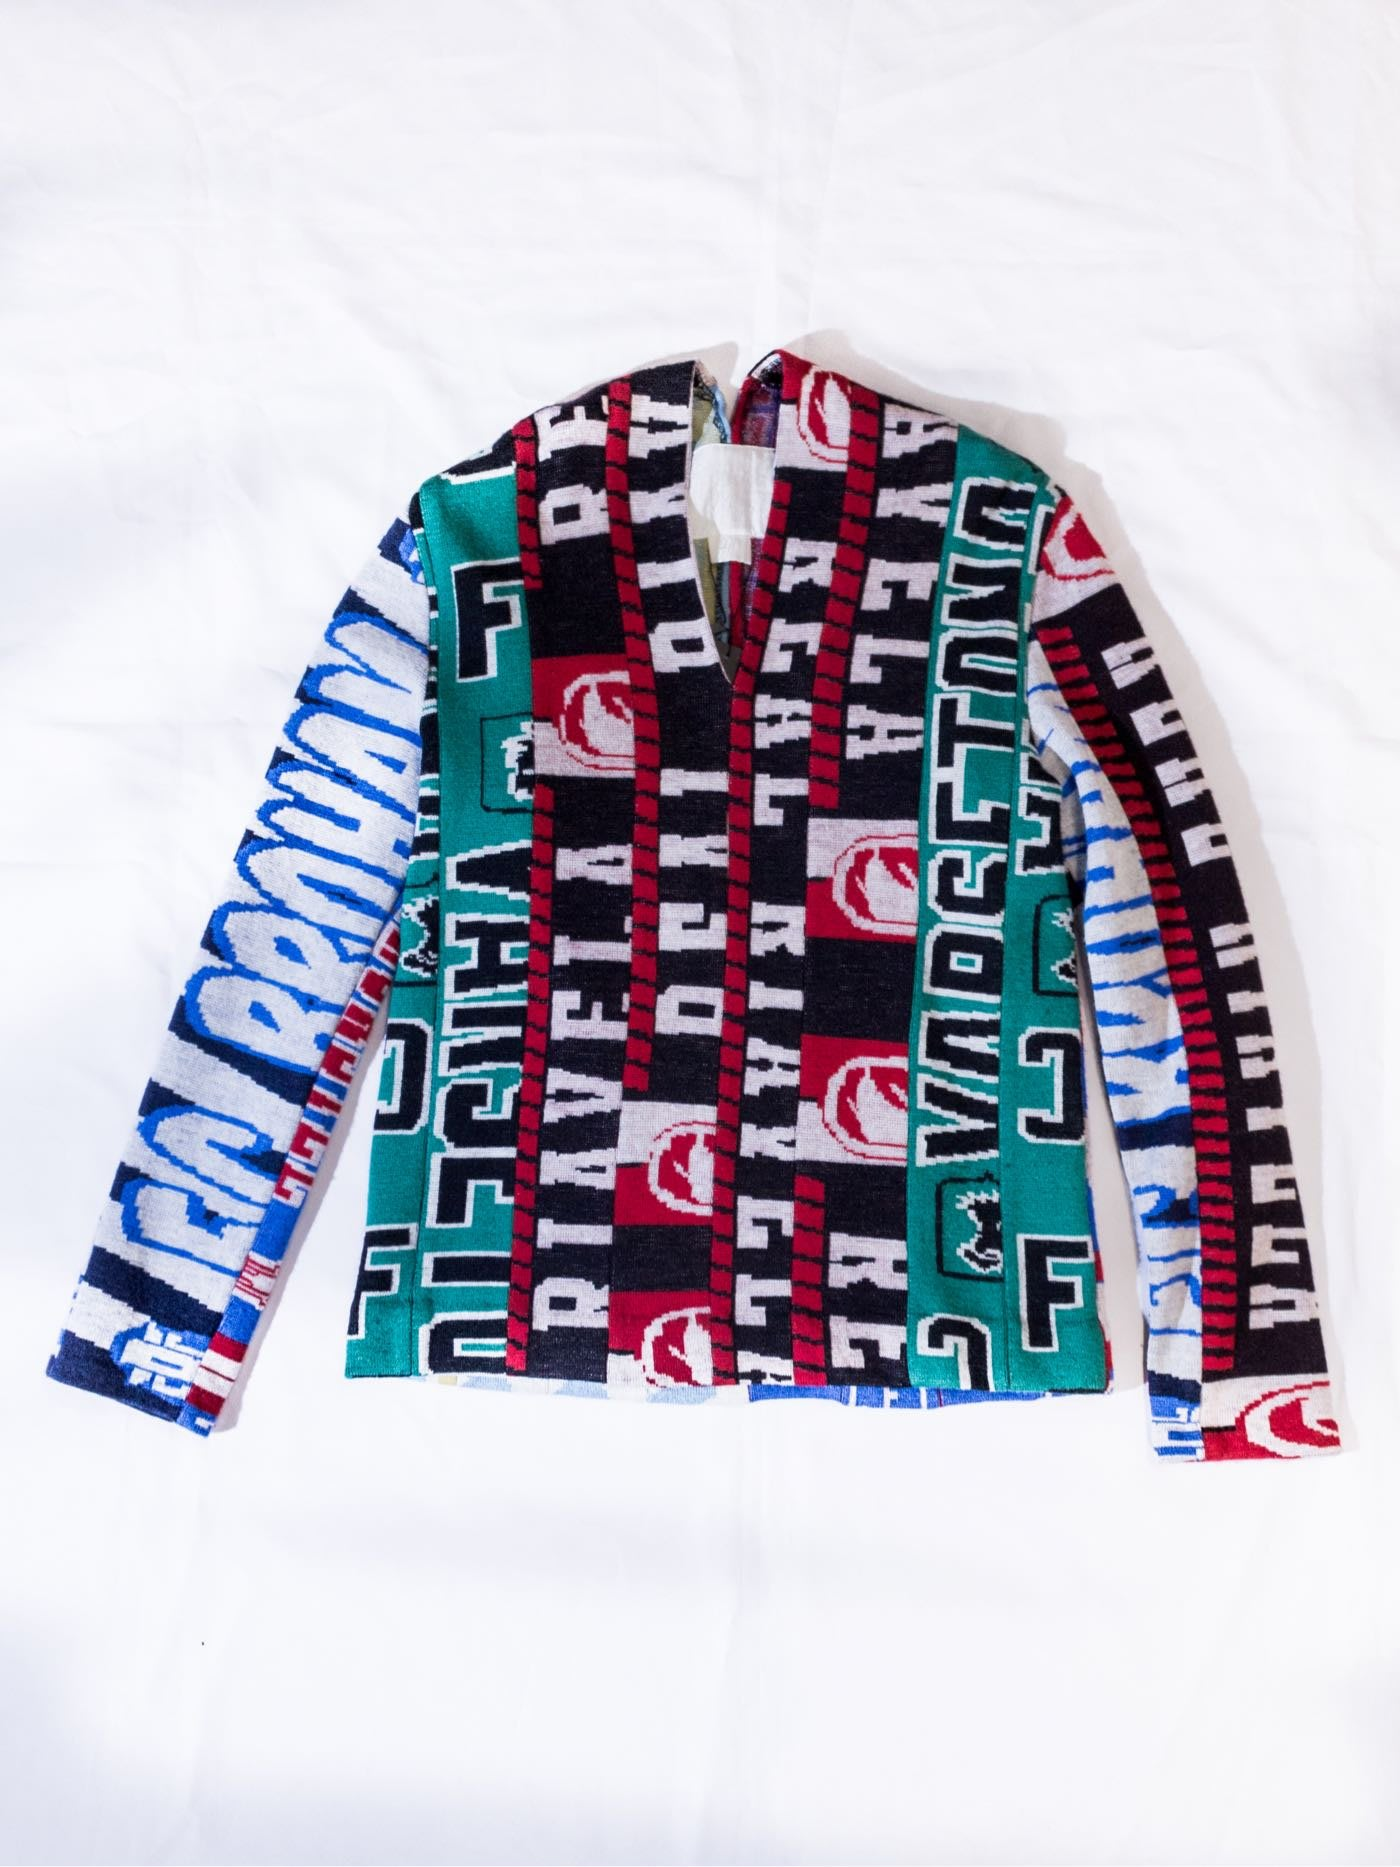 Masion margiela x H&M Joint stitching knitted jacket. 針織 外套